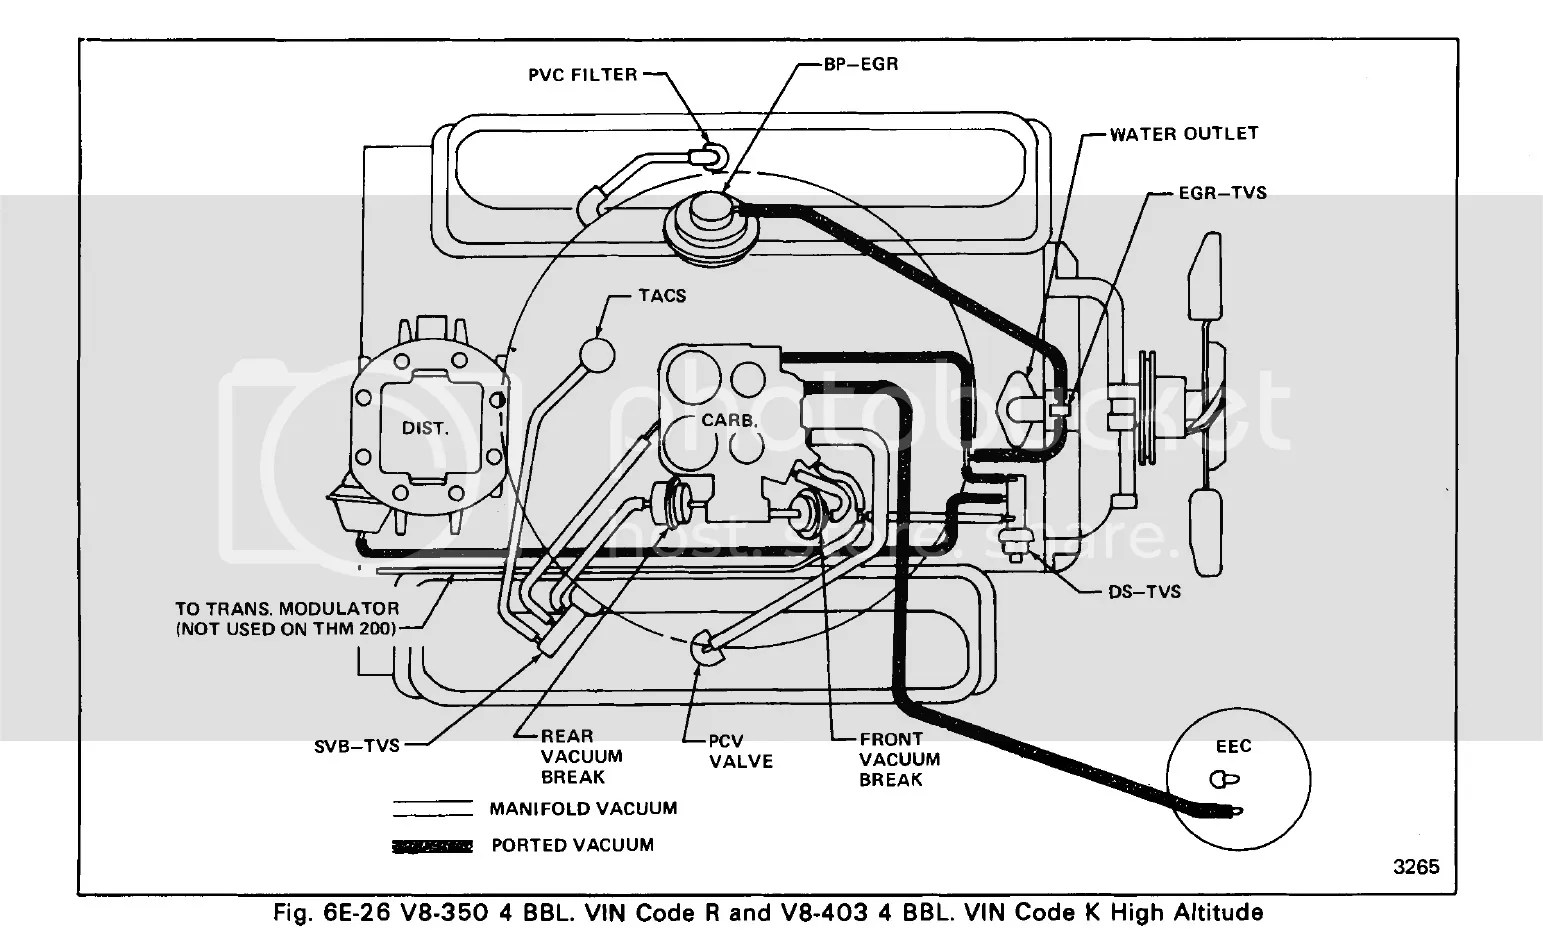 hight resolution of 1978 oldsmobile engine diagram wiring diagram view oldsmobile engine diagram 1978 pontiac 403 engine diagram wiring